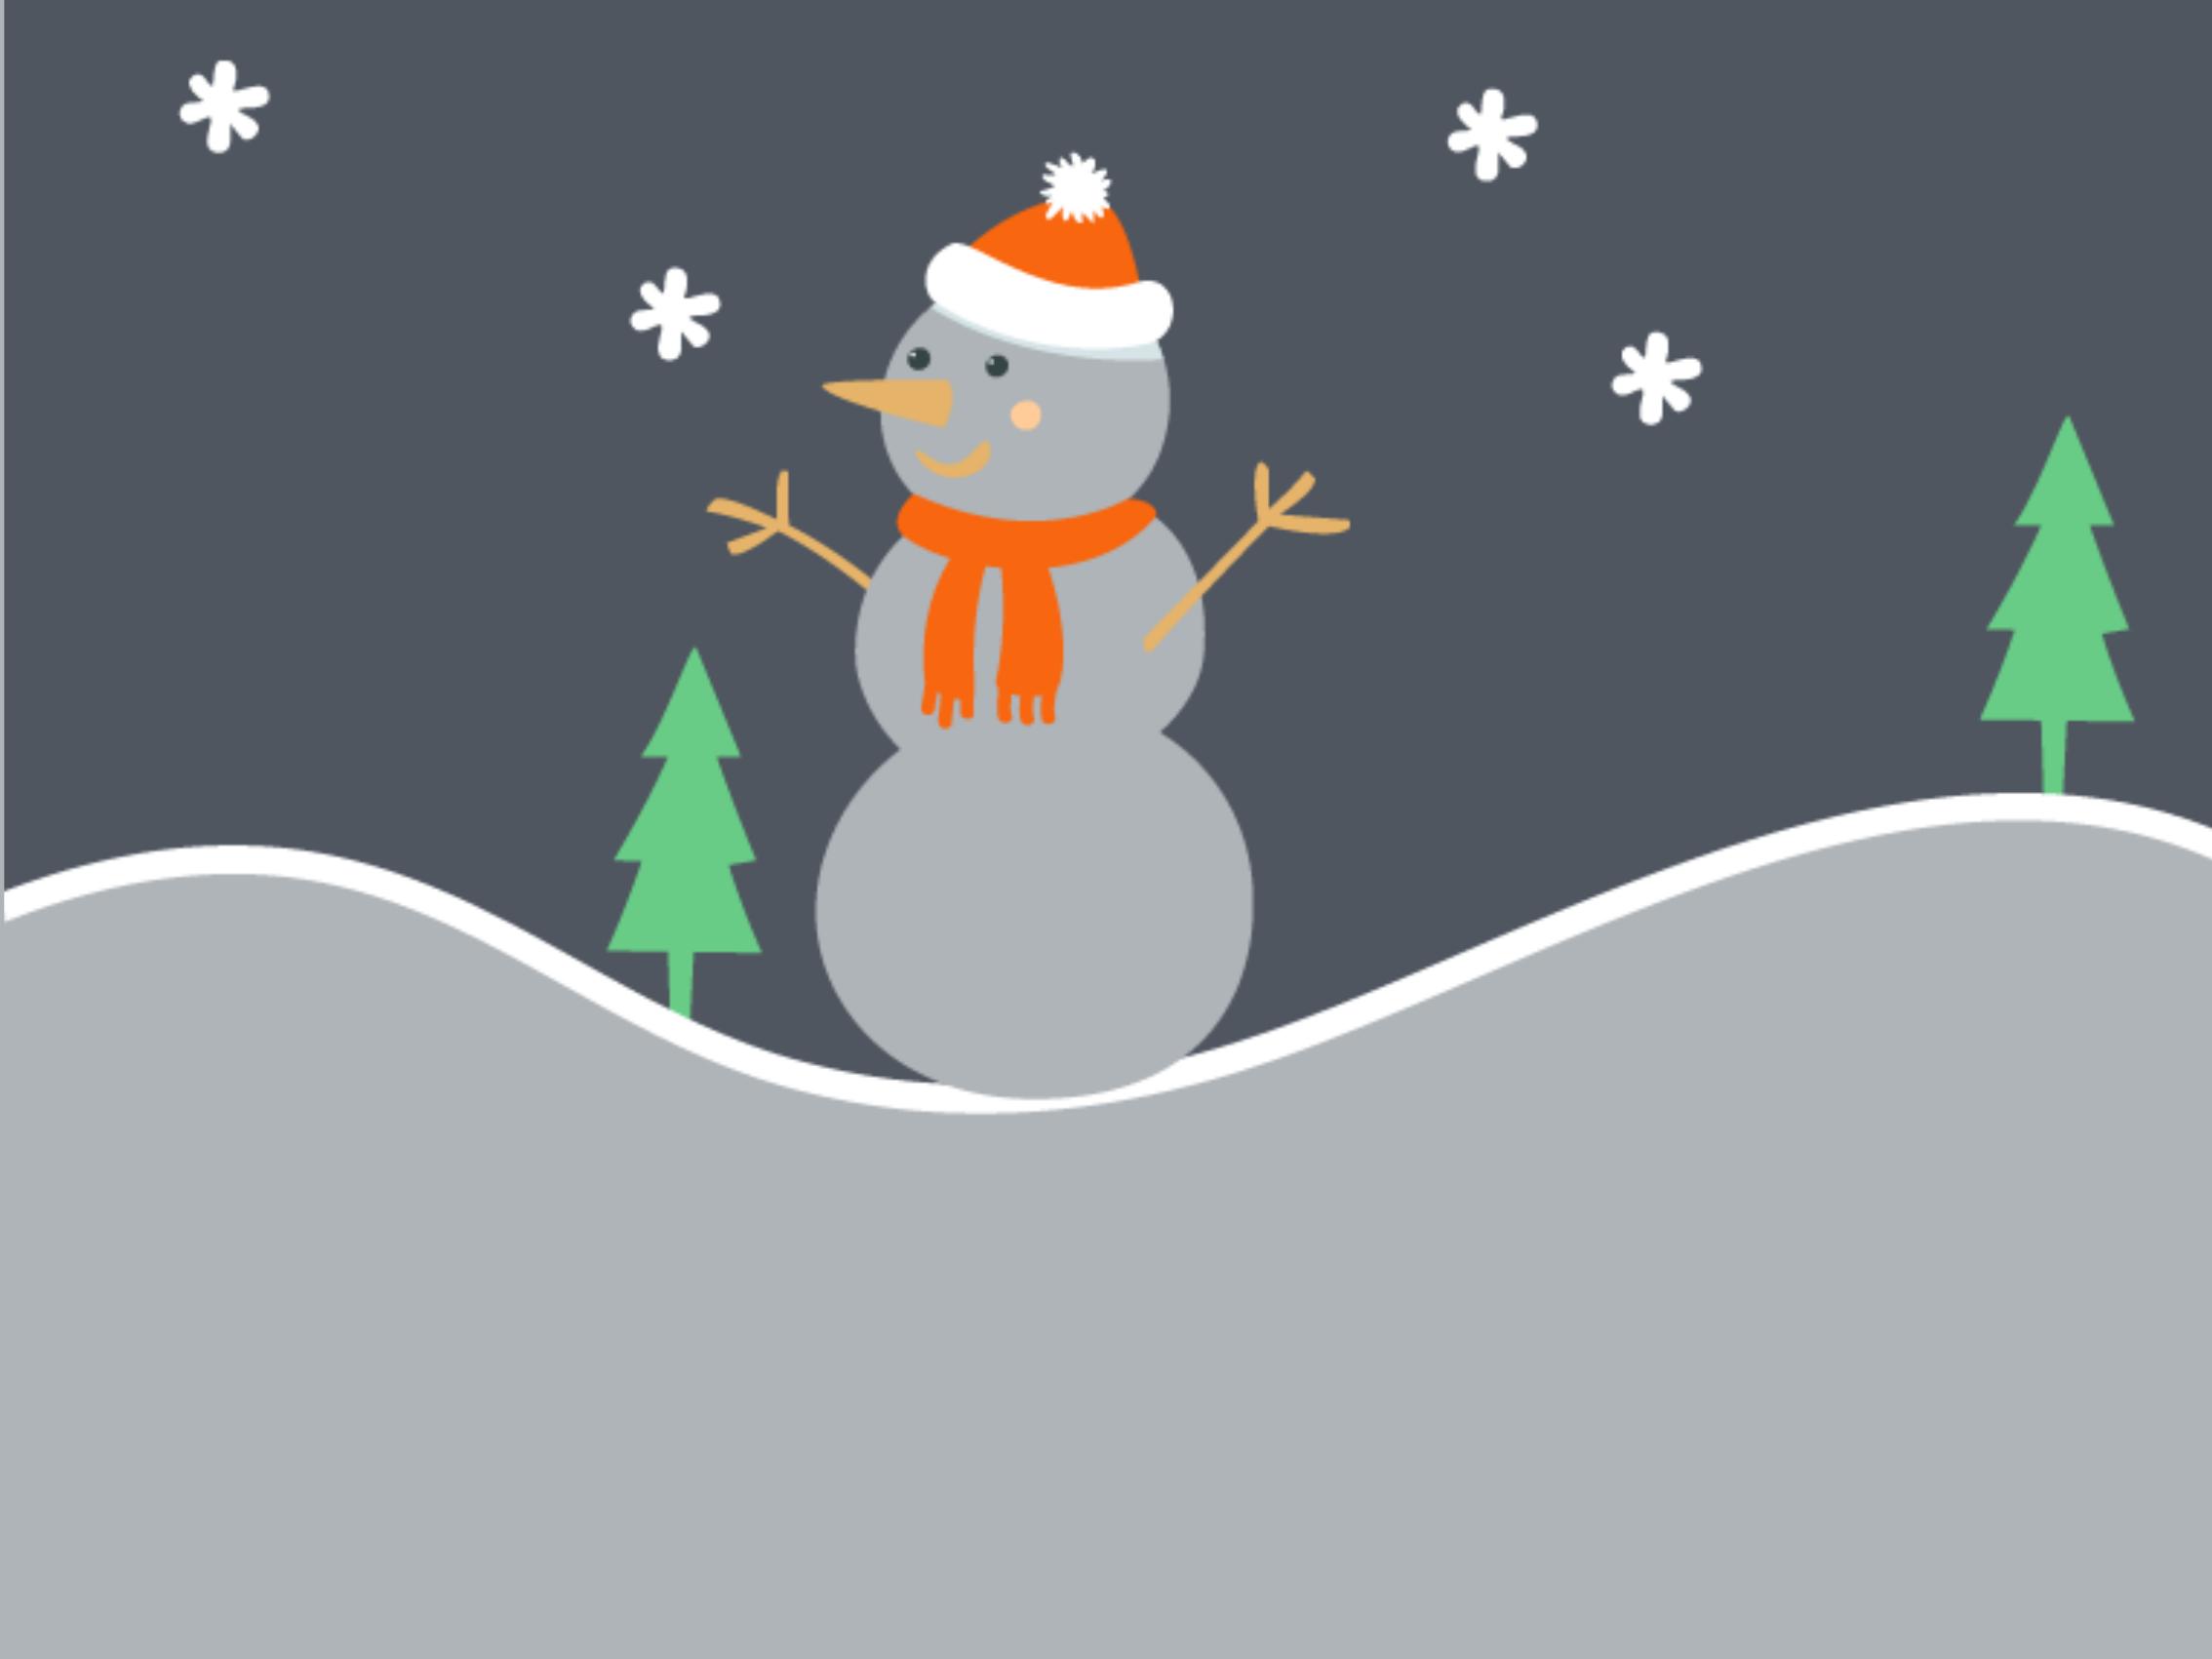 Snowman 999-1819